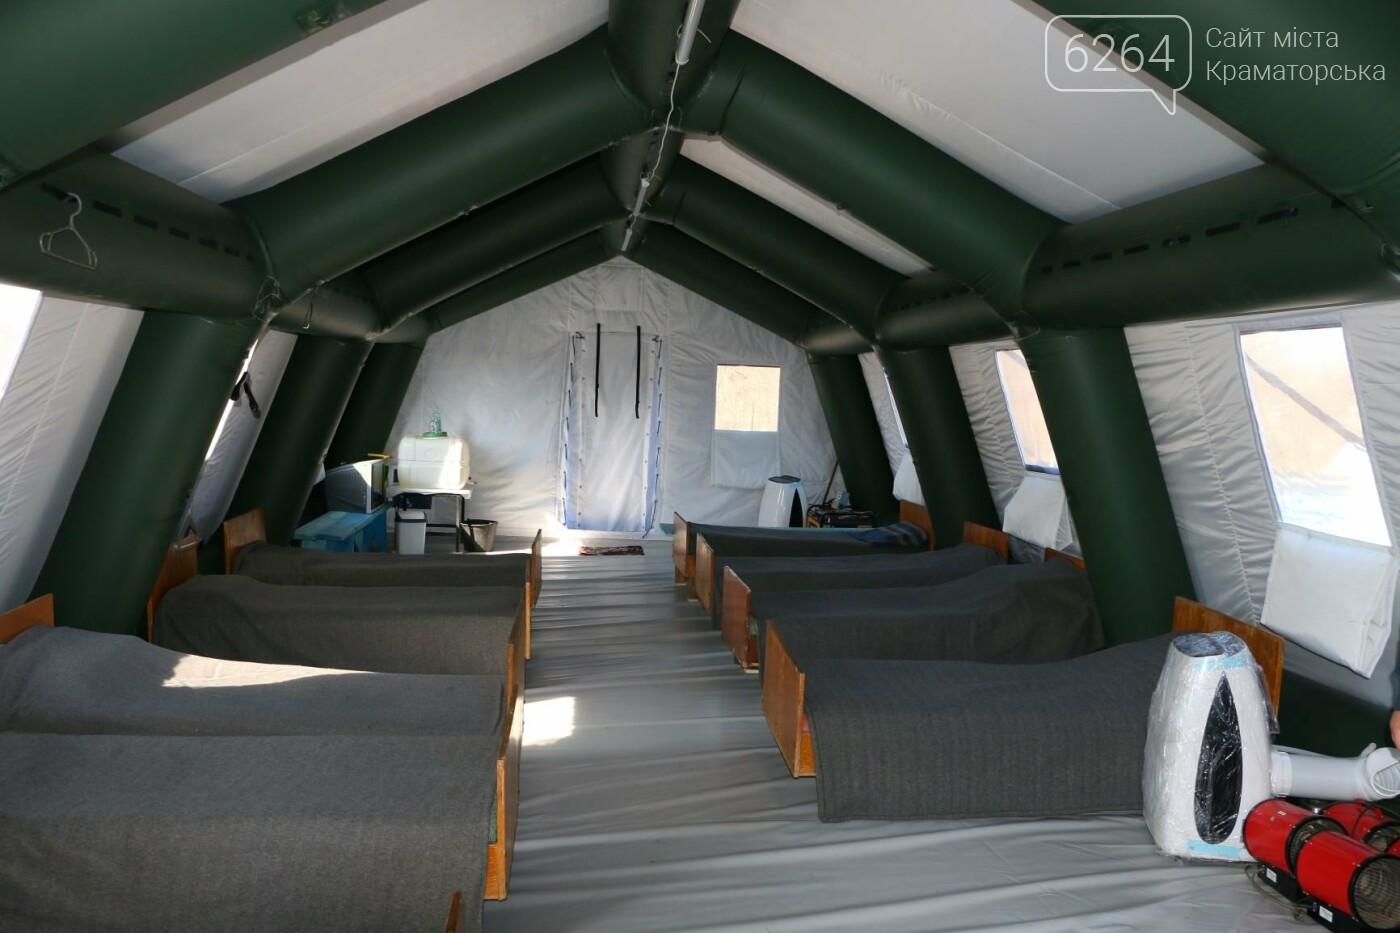 В Донецкой области обновили модули пунктов оказания помощи при КПВВ, фото-2